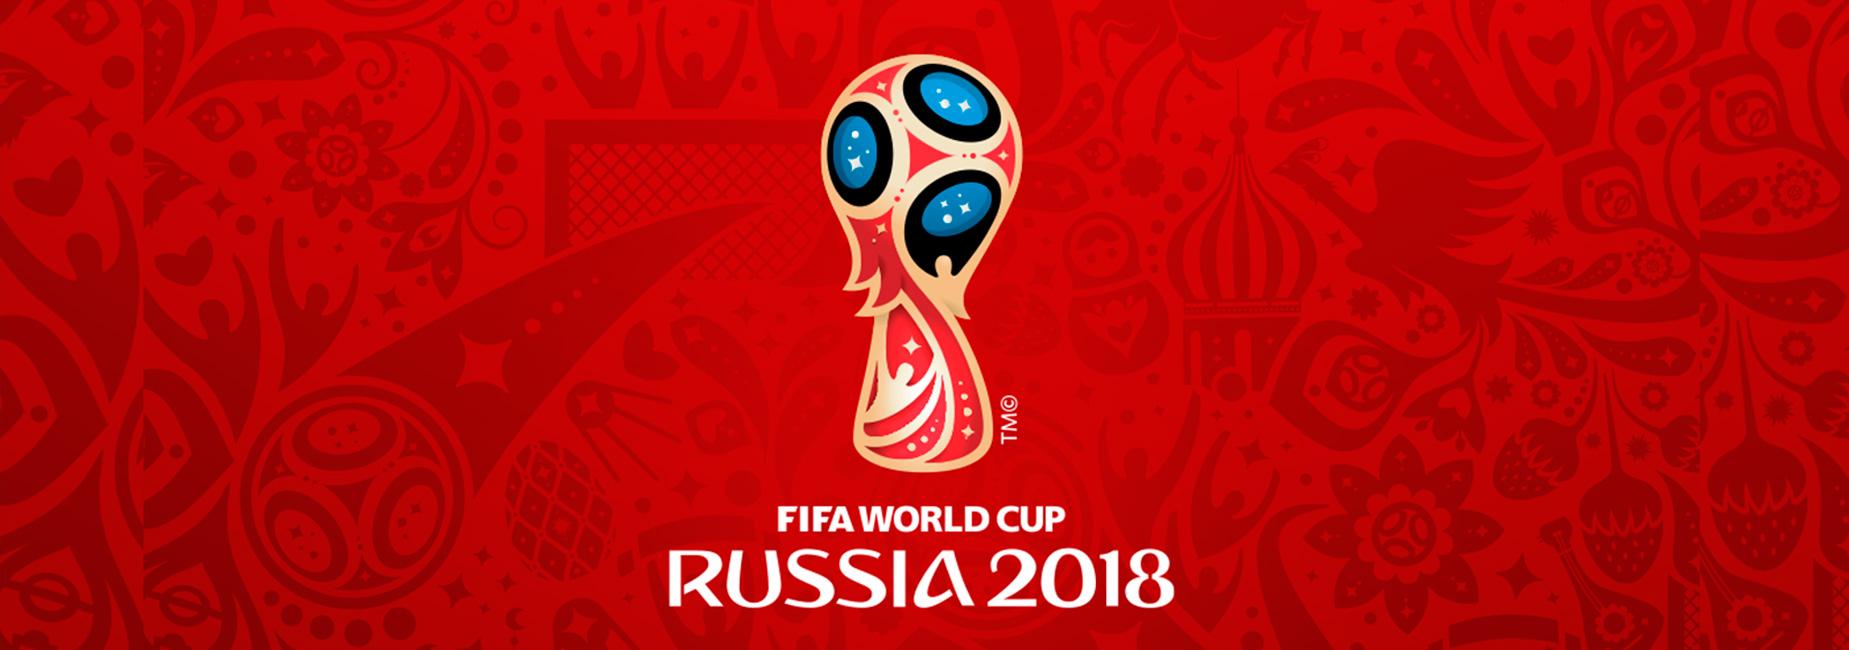 جام جهانی اسپیرو